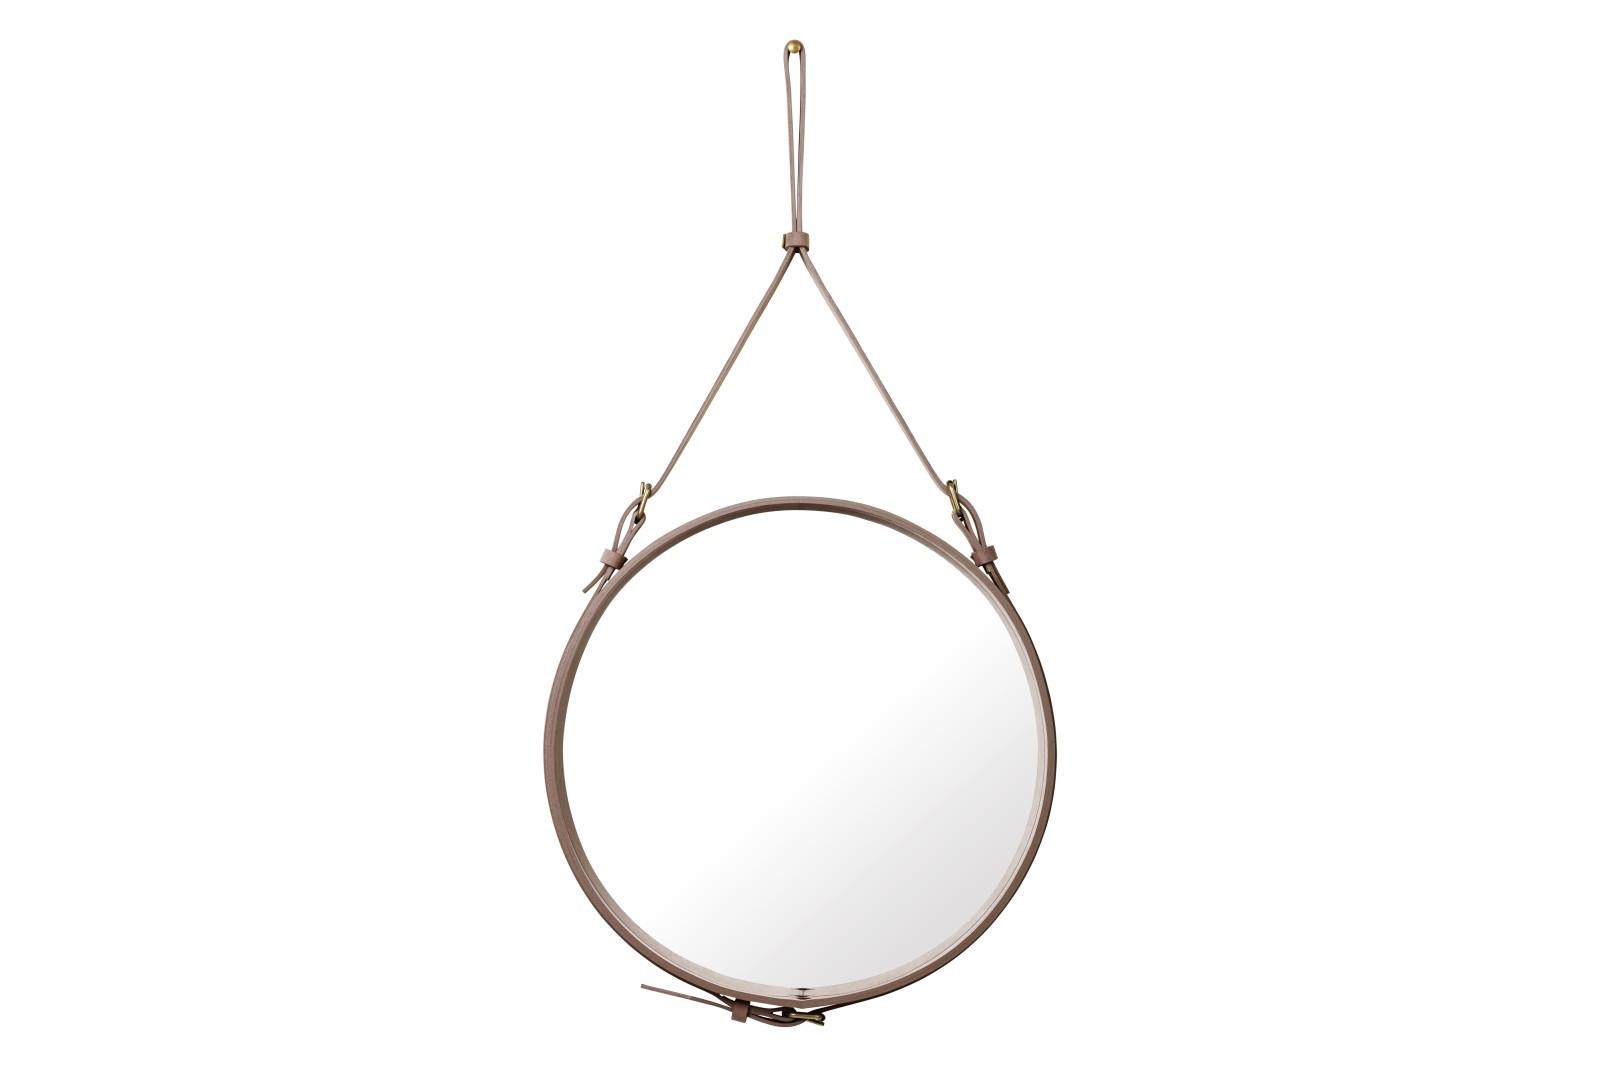 Adnet Wall Mirror, Circular, Ø58 Alcantara (Dusty Cedar)